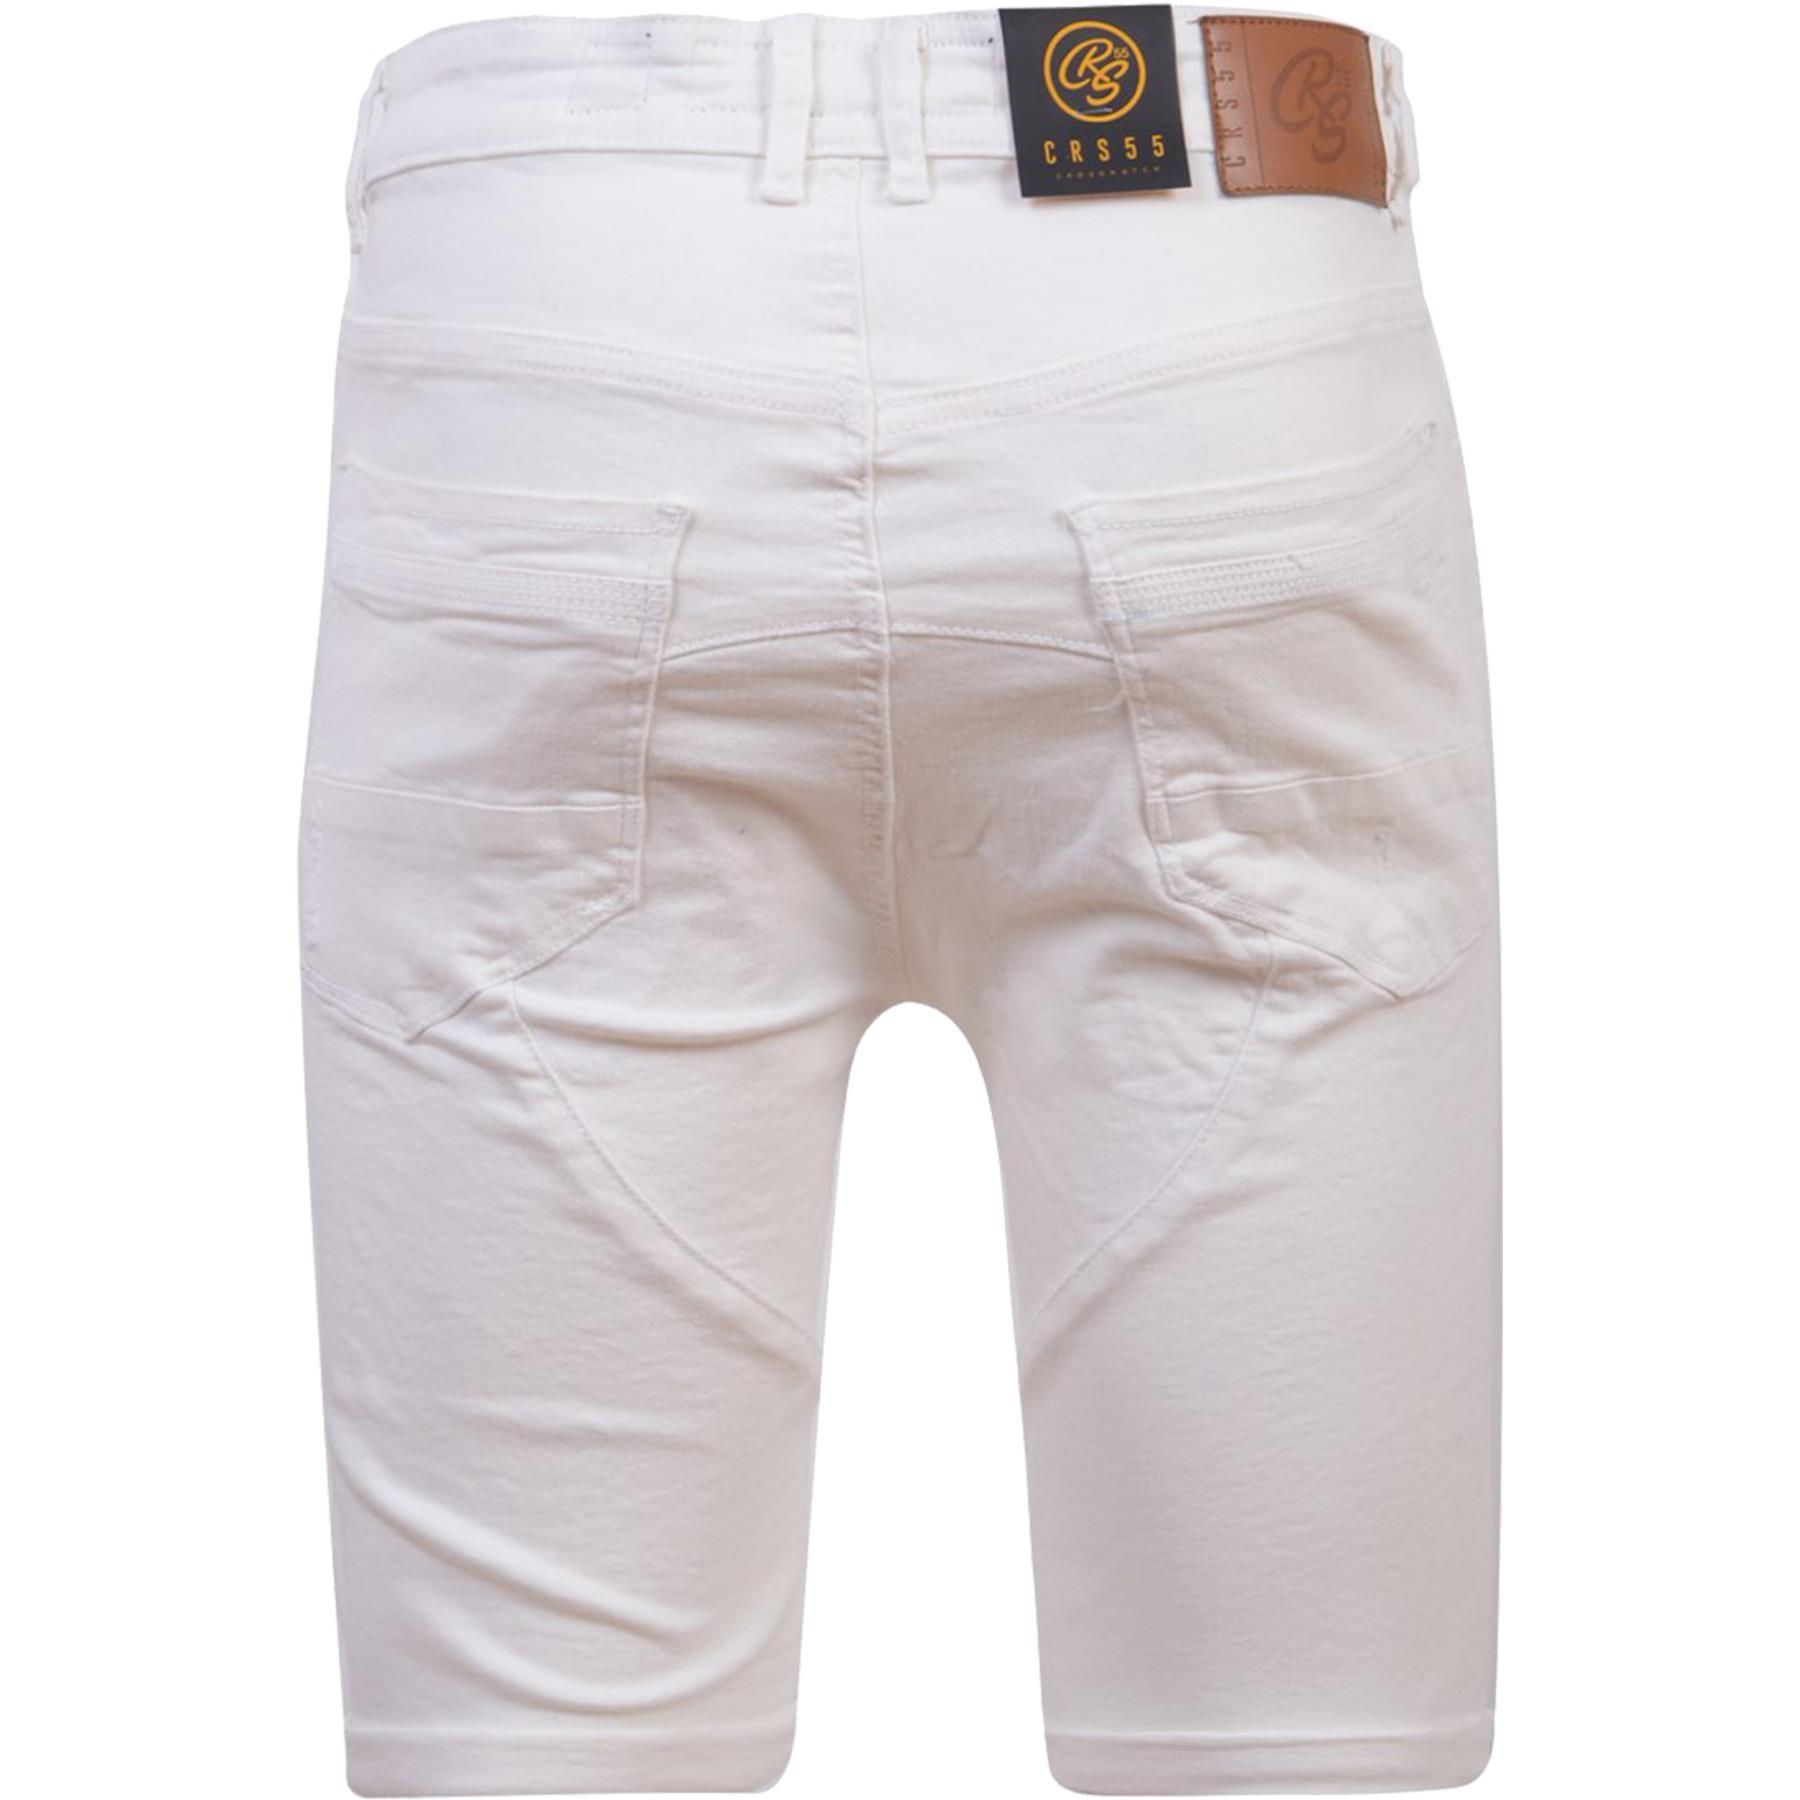 New-Mens-Crosshatch-Canvas-Cargo-Denim-Camo-Shorts-Chino-2019-Styles-30-42-034 thumbnail 55